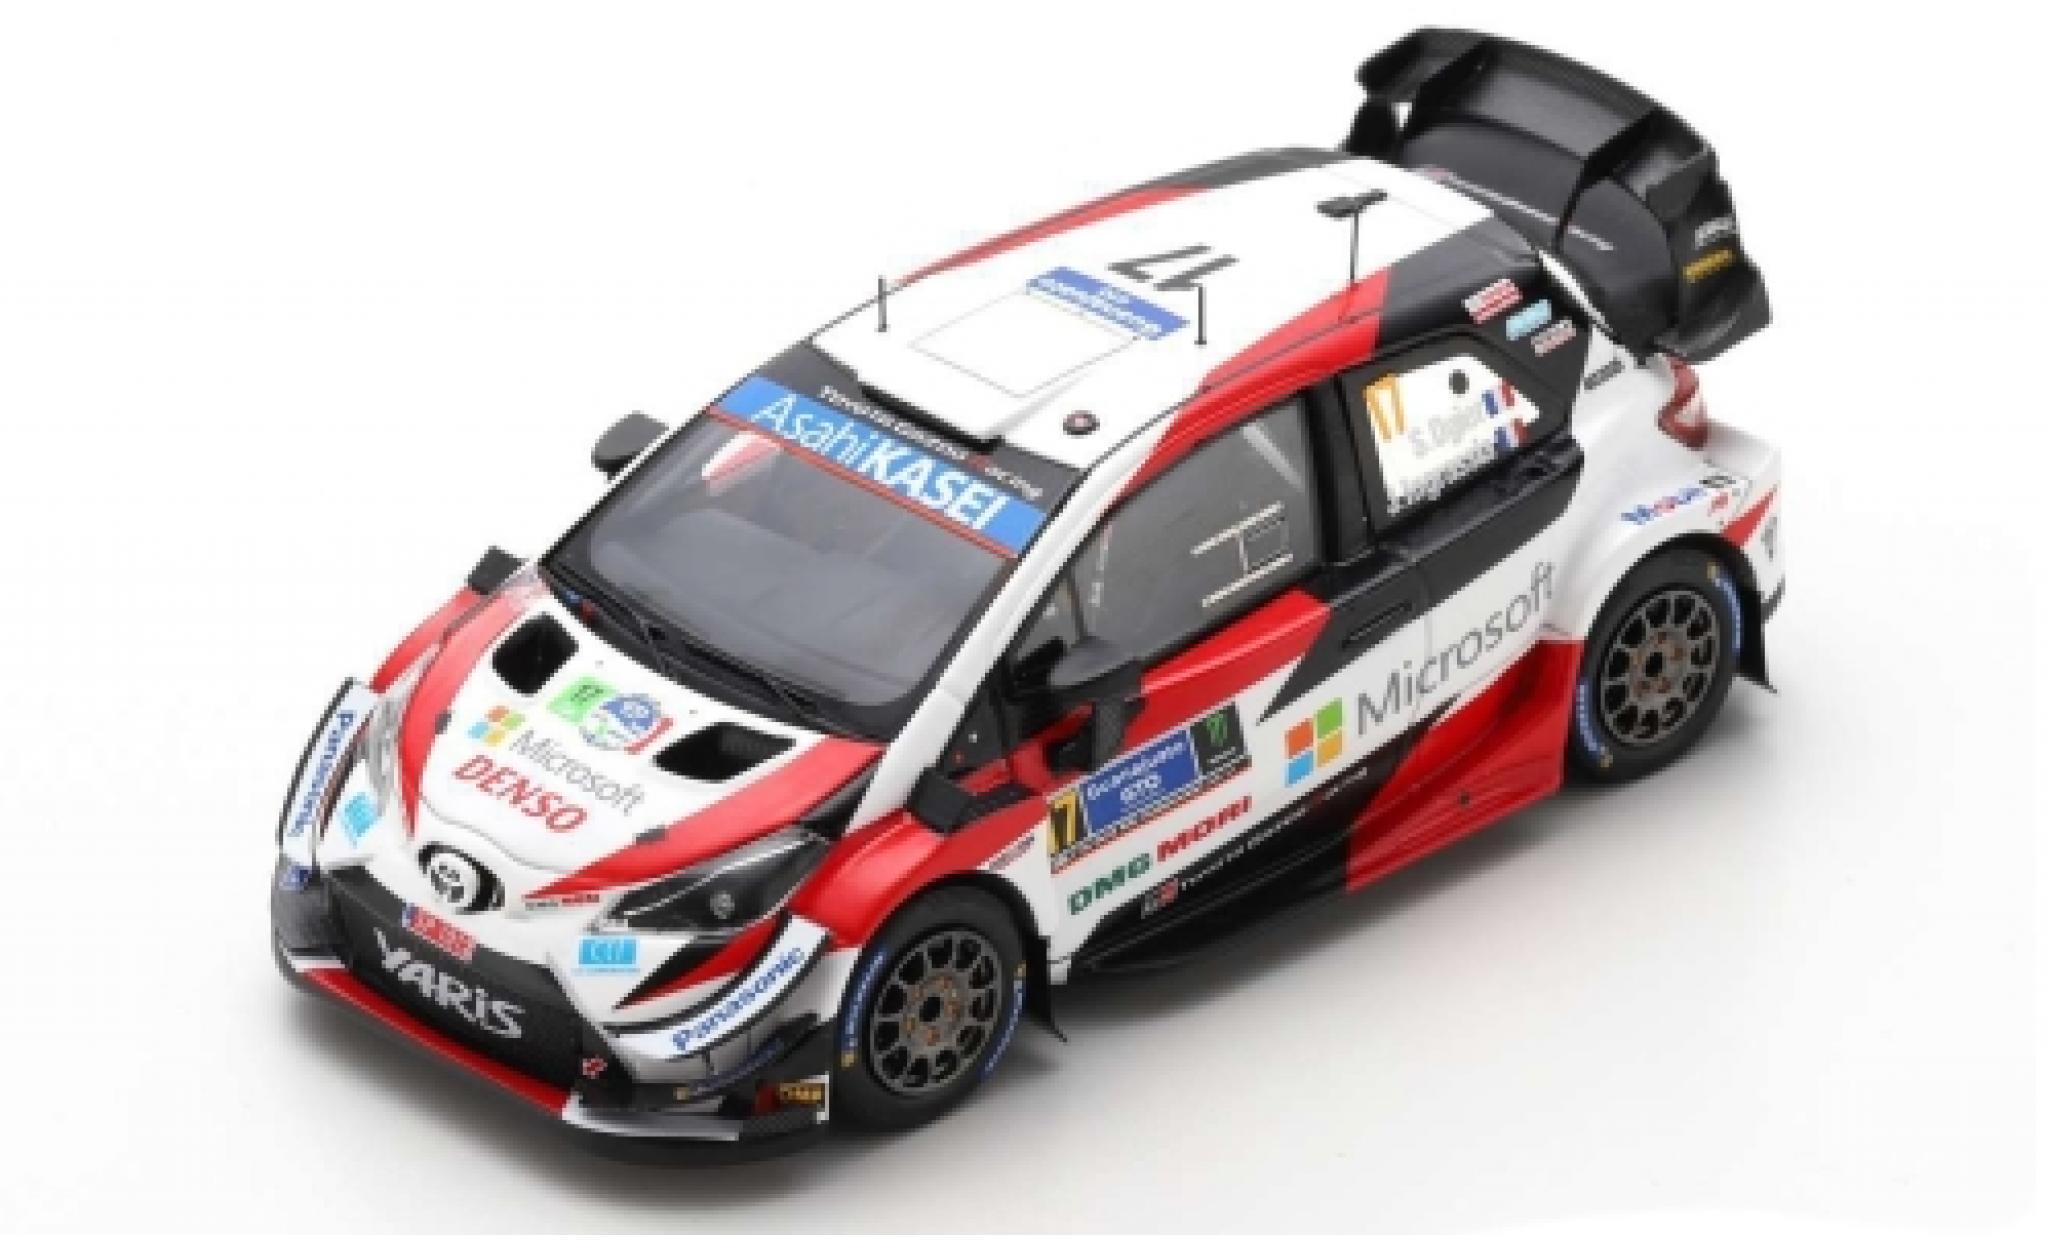 Toyota Yaris 1/43 Spark WRC No.17 Gazoo Racing Microsoft Rallye WM Rally Mexico 2020 S.Ogier/J.Ingrassia